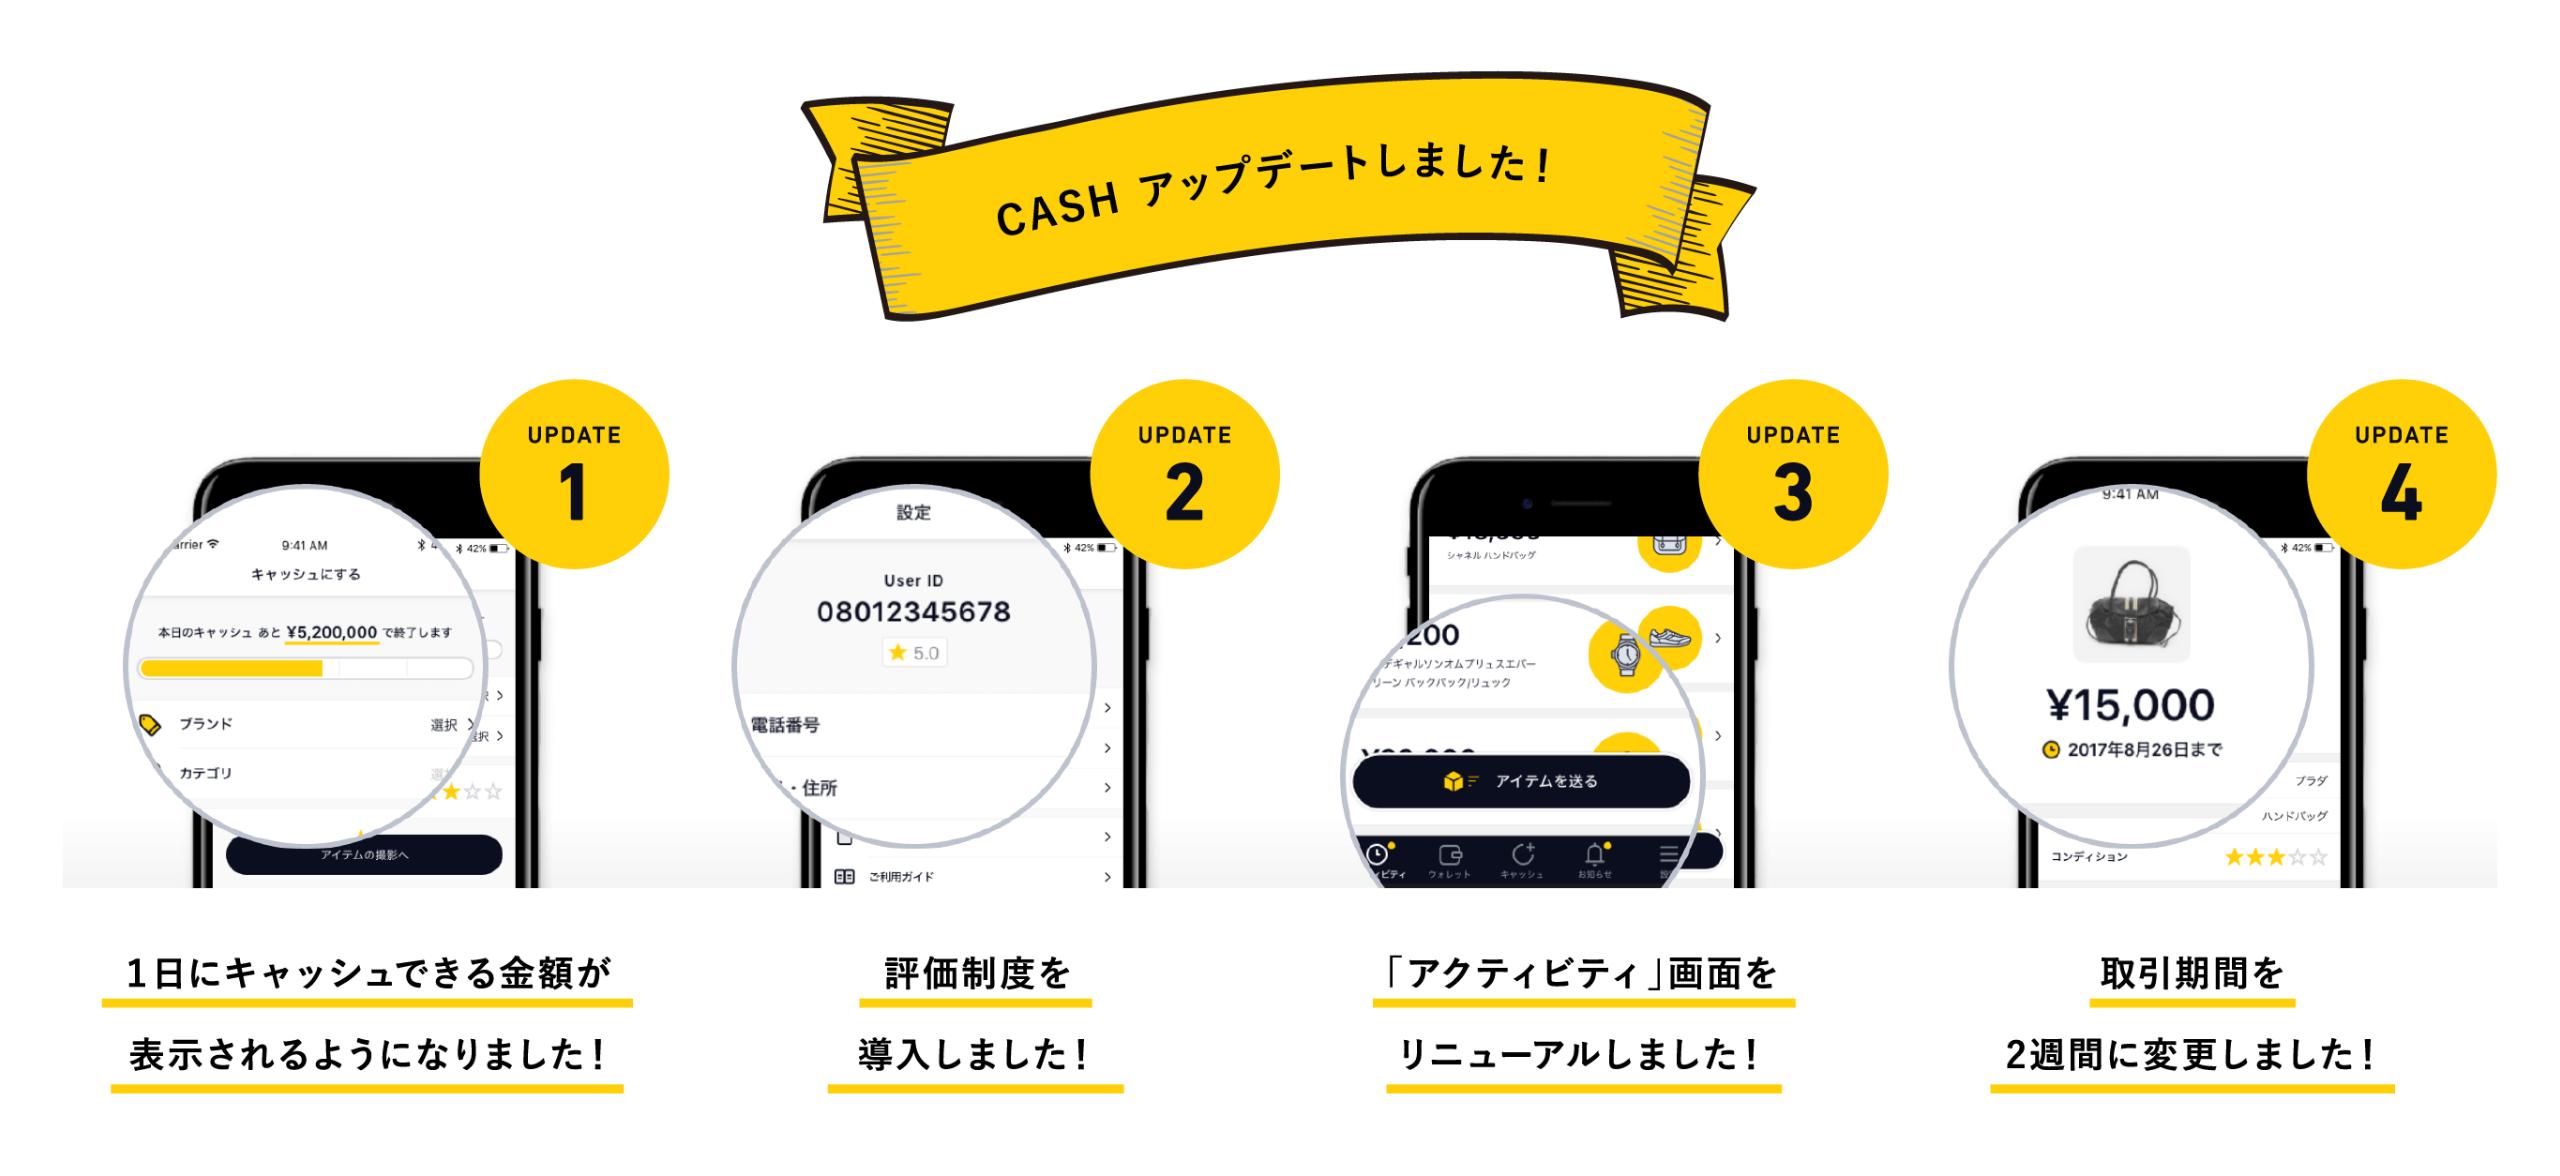 cash_comeback_update_s